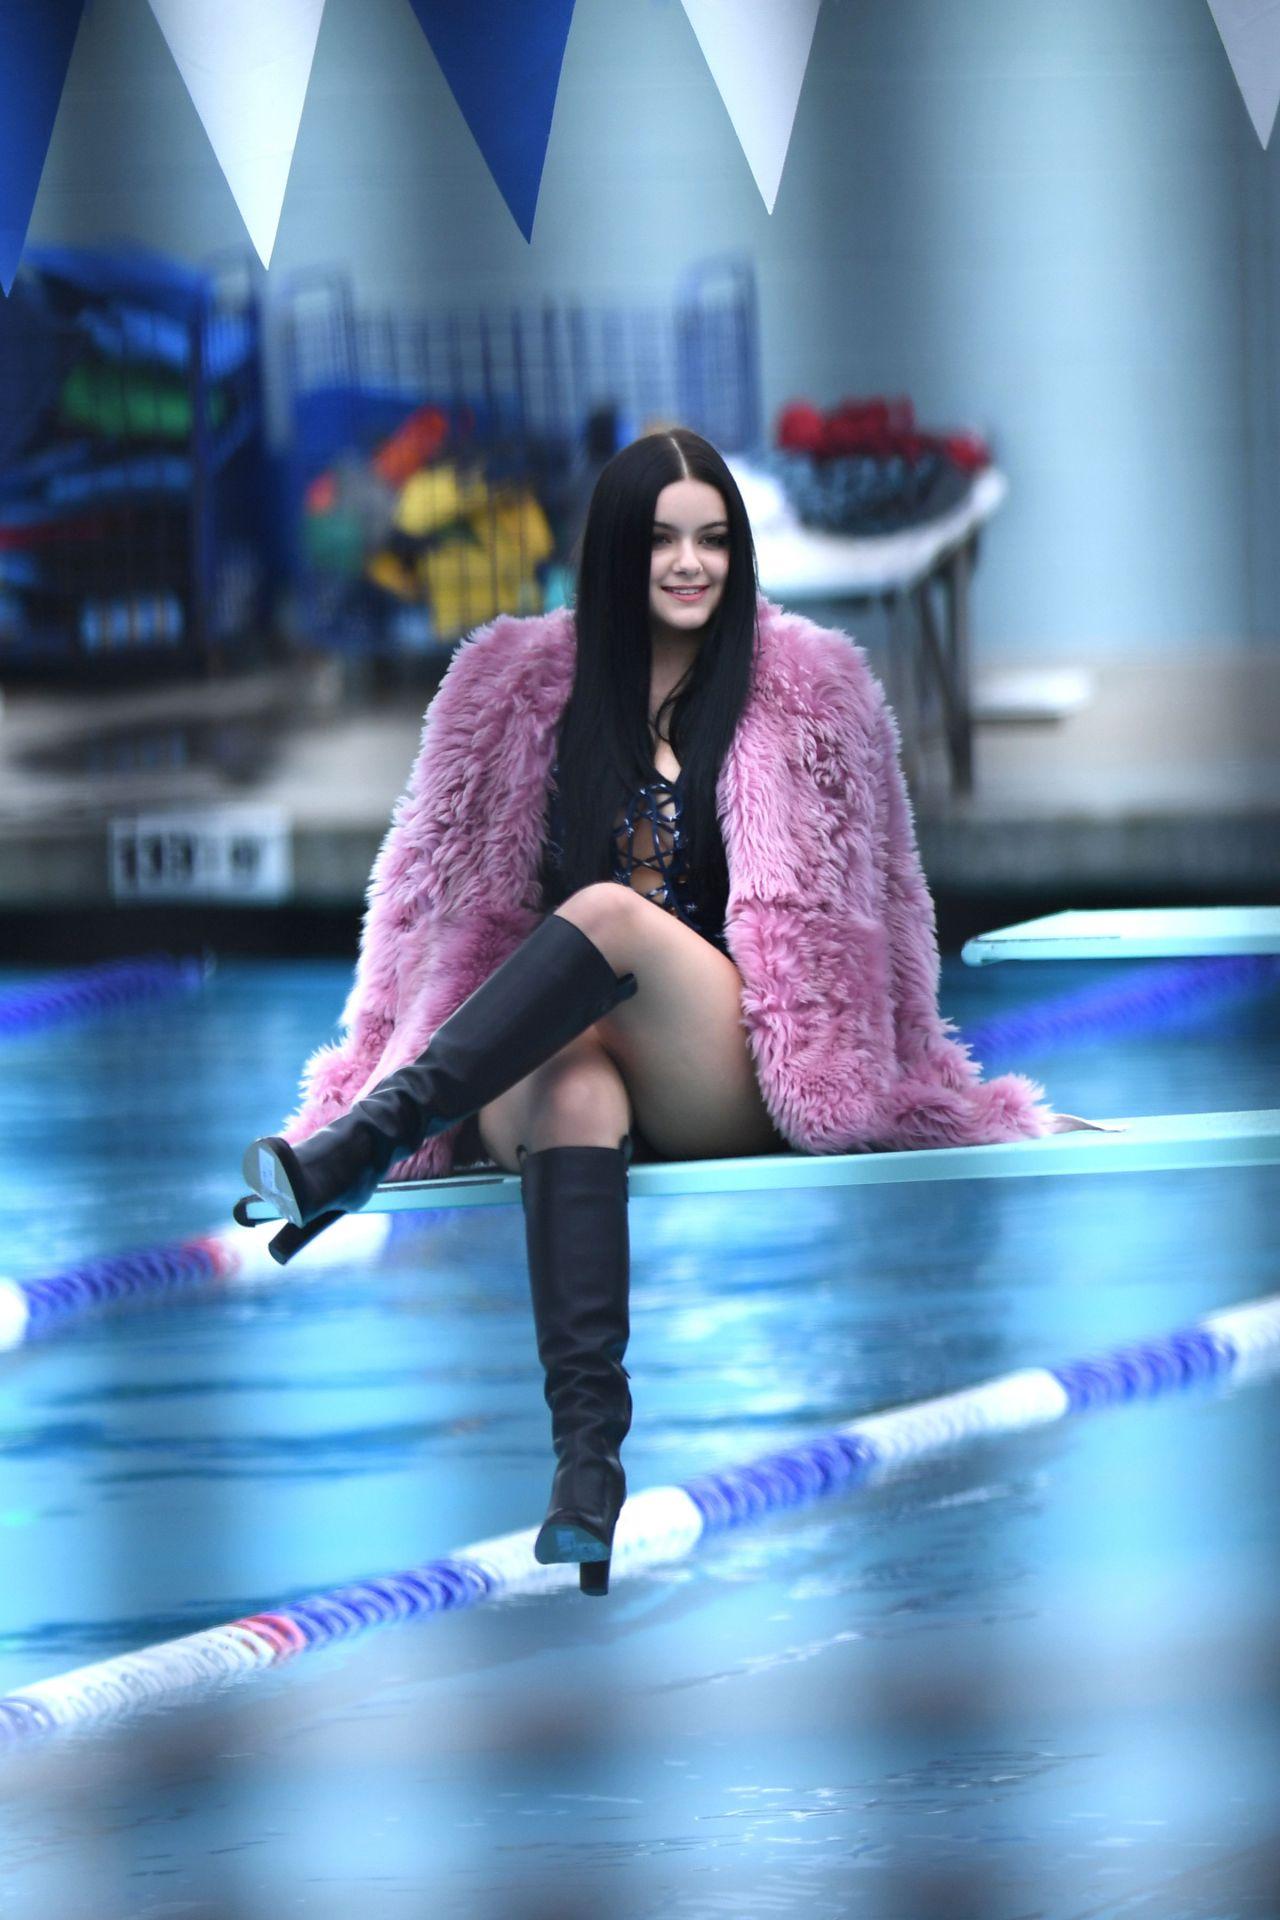 Ariel Winter Photoshoot In Los Angeles 10 29 2016